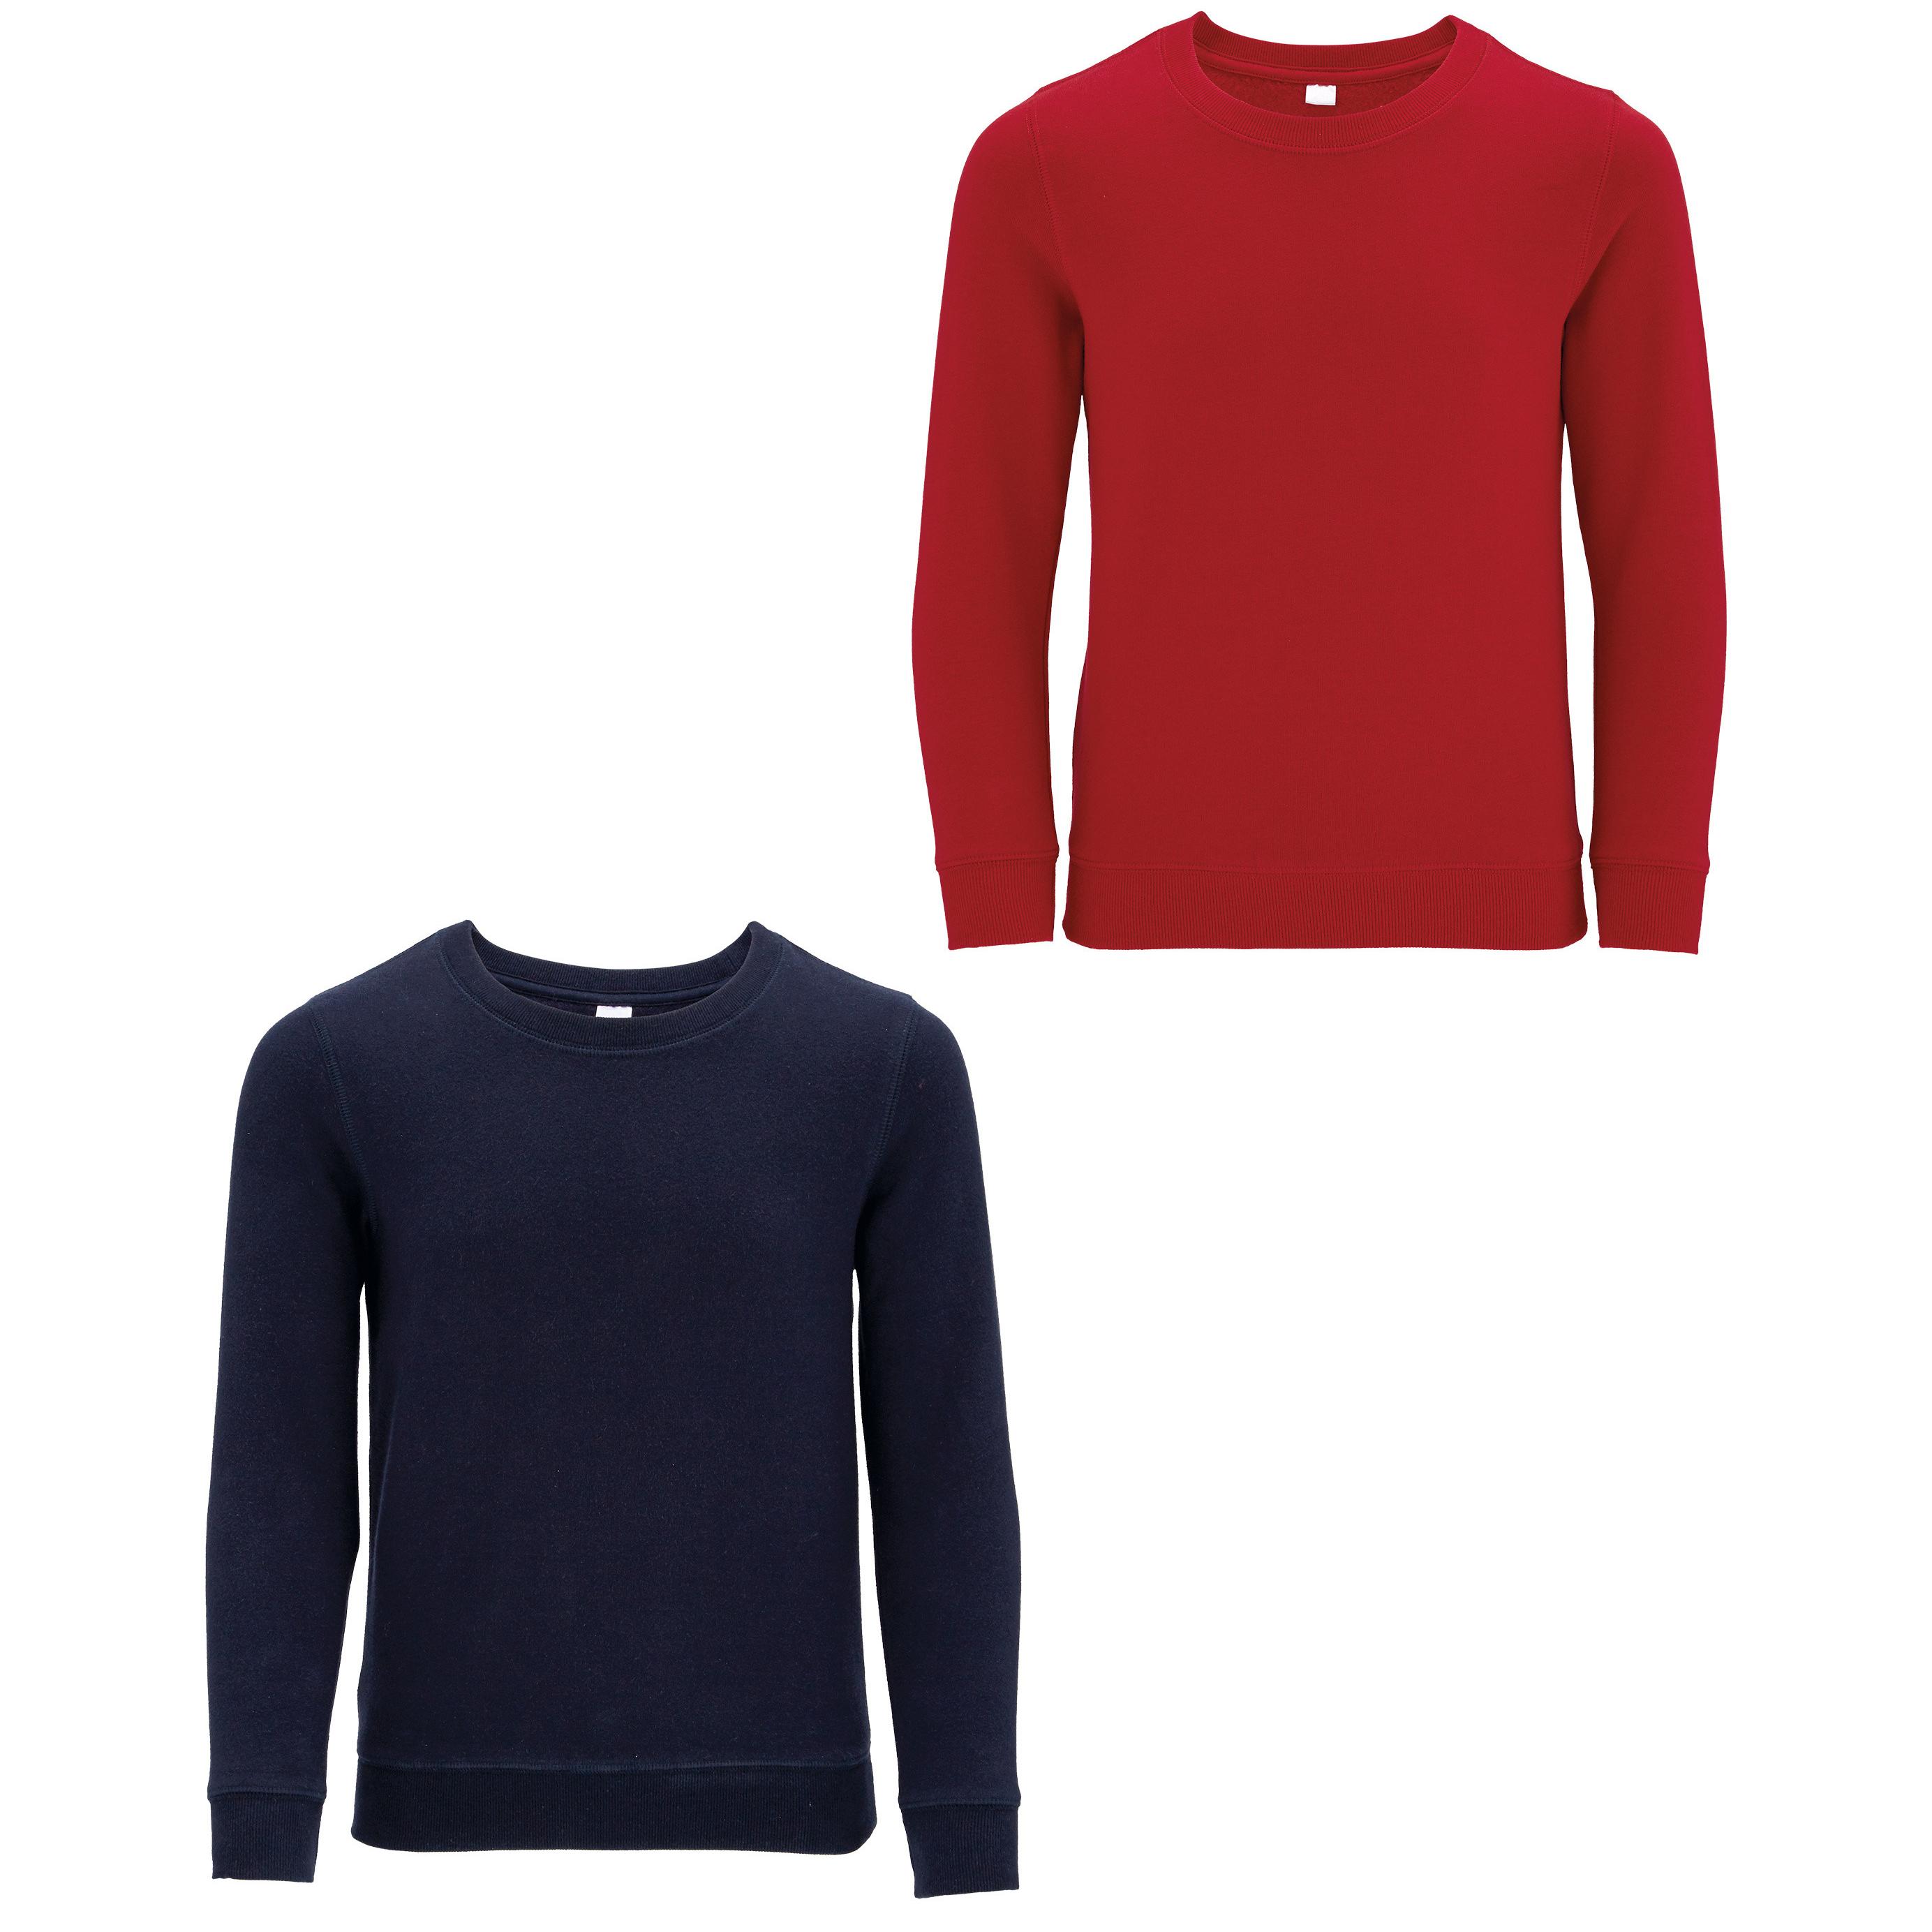 School Uniform : Sweatshirt £1, 2 Polo Shirts £1.75, Skirt £1.75, Trousers £1.75, (More see post) @ Aldi (Instore)